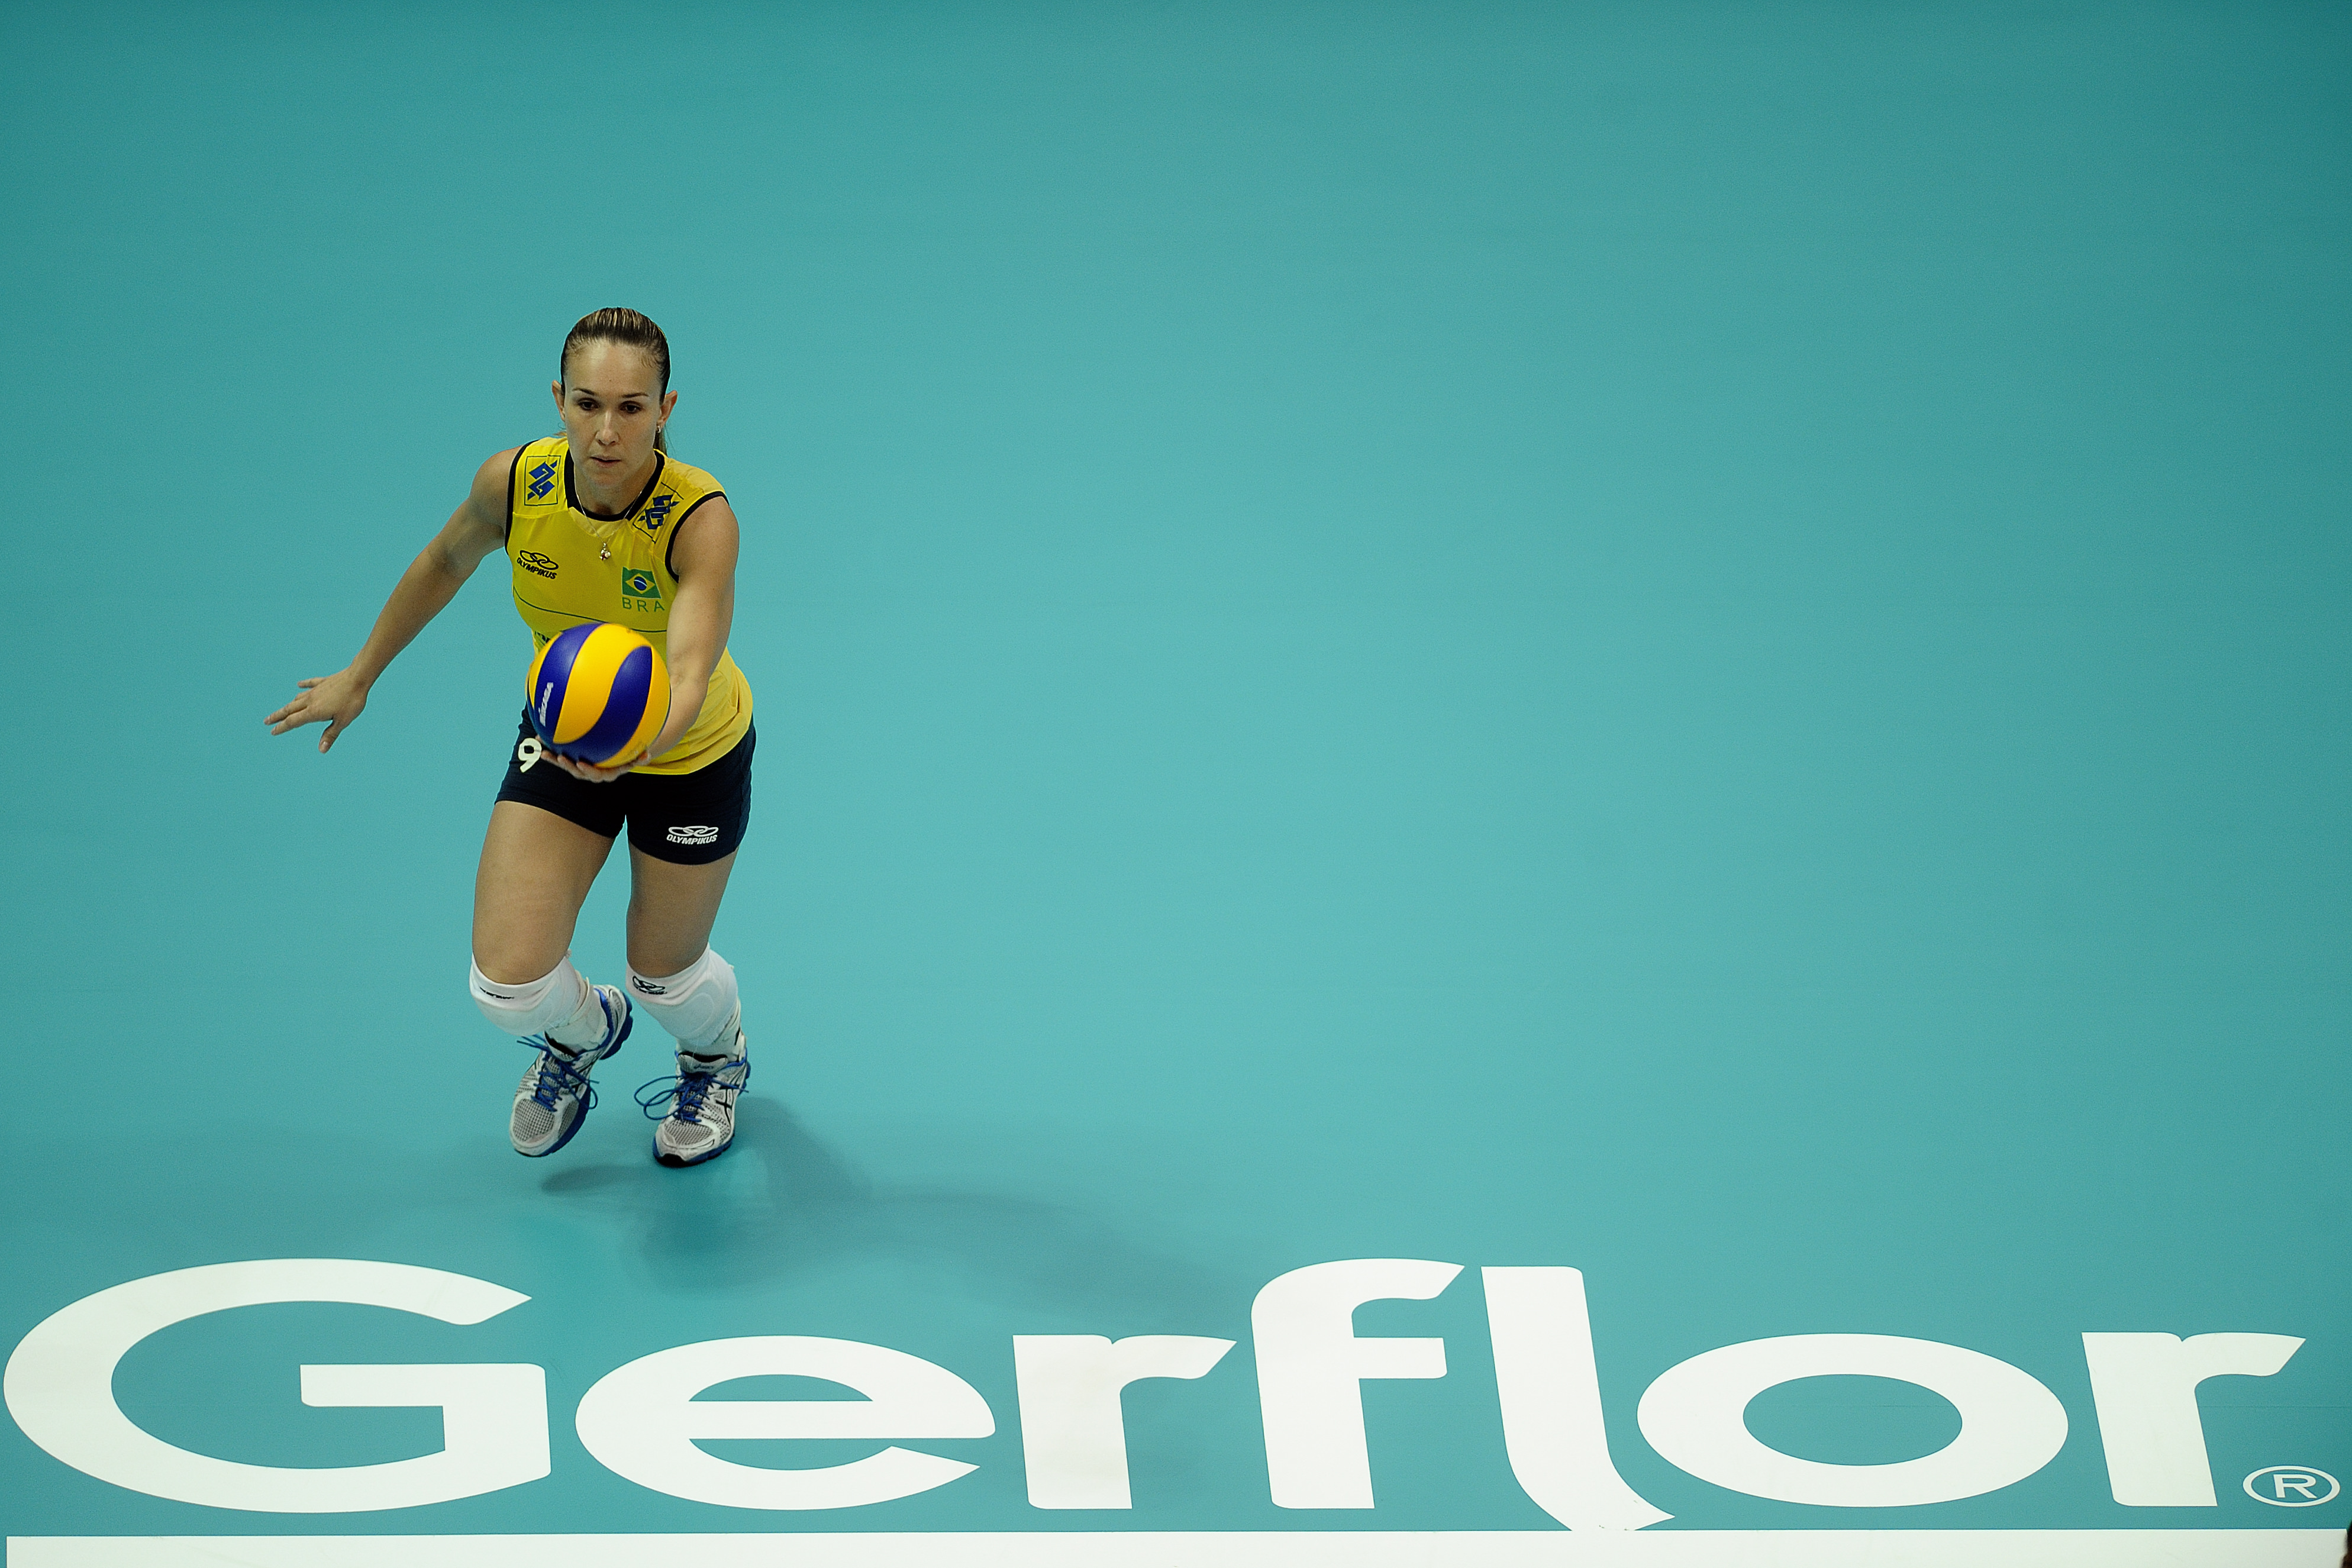 Fernanda Ferreira serving by the Gerflor floorsticker